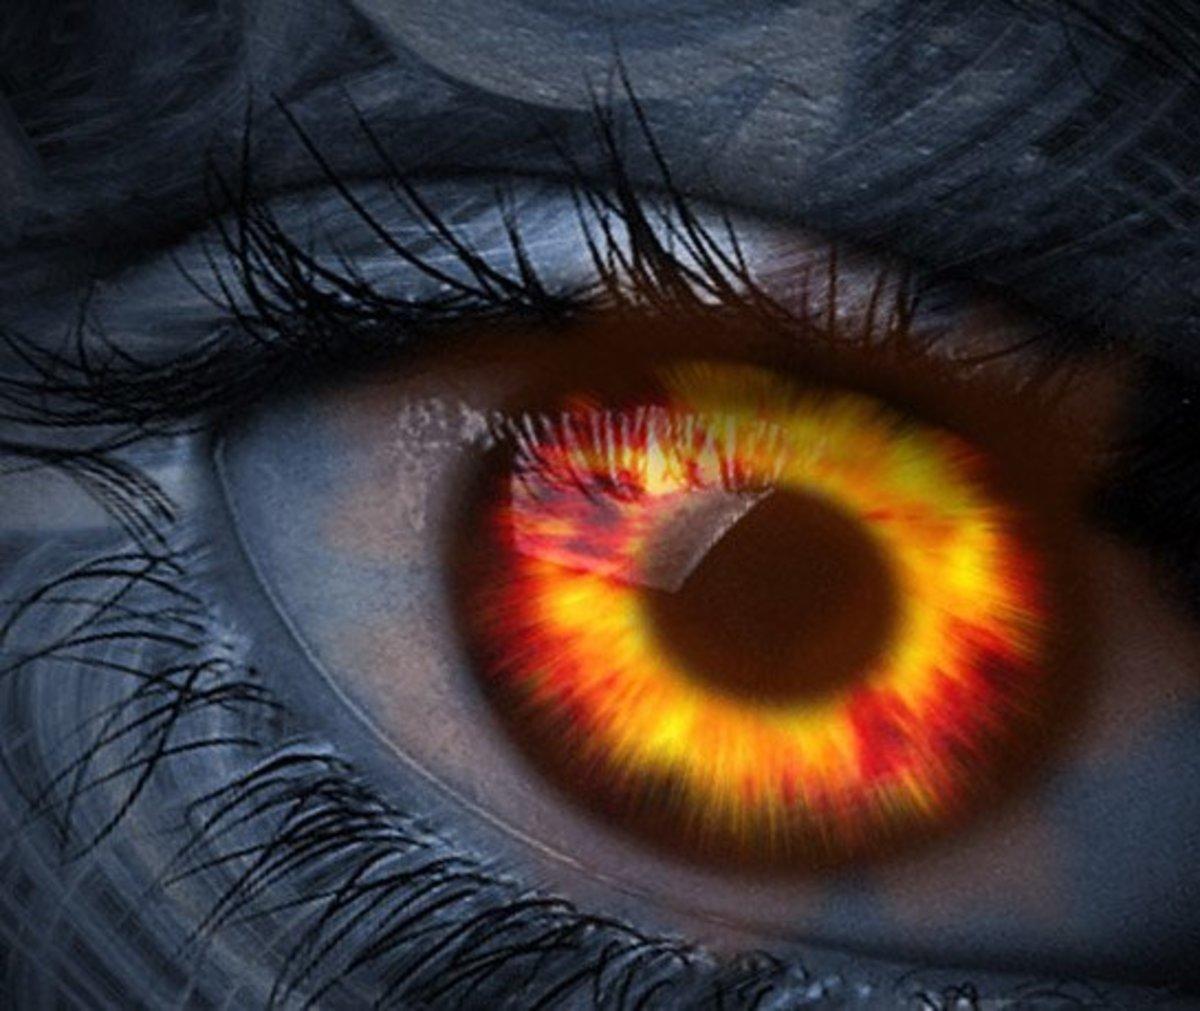 removing-evil-eye